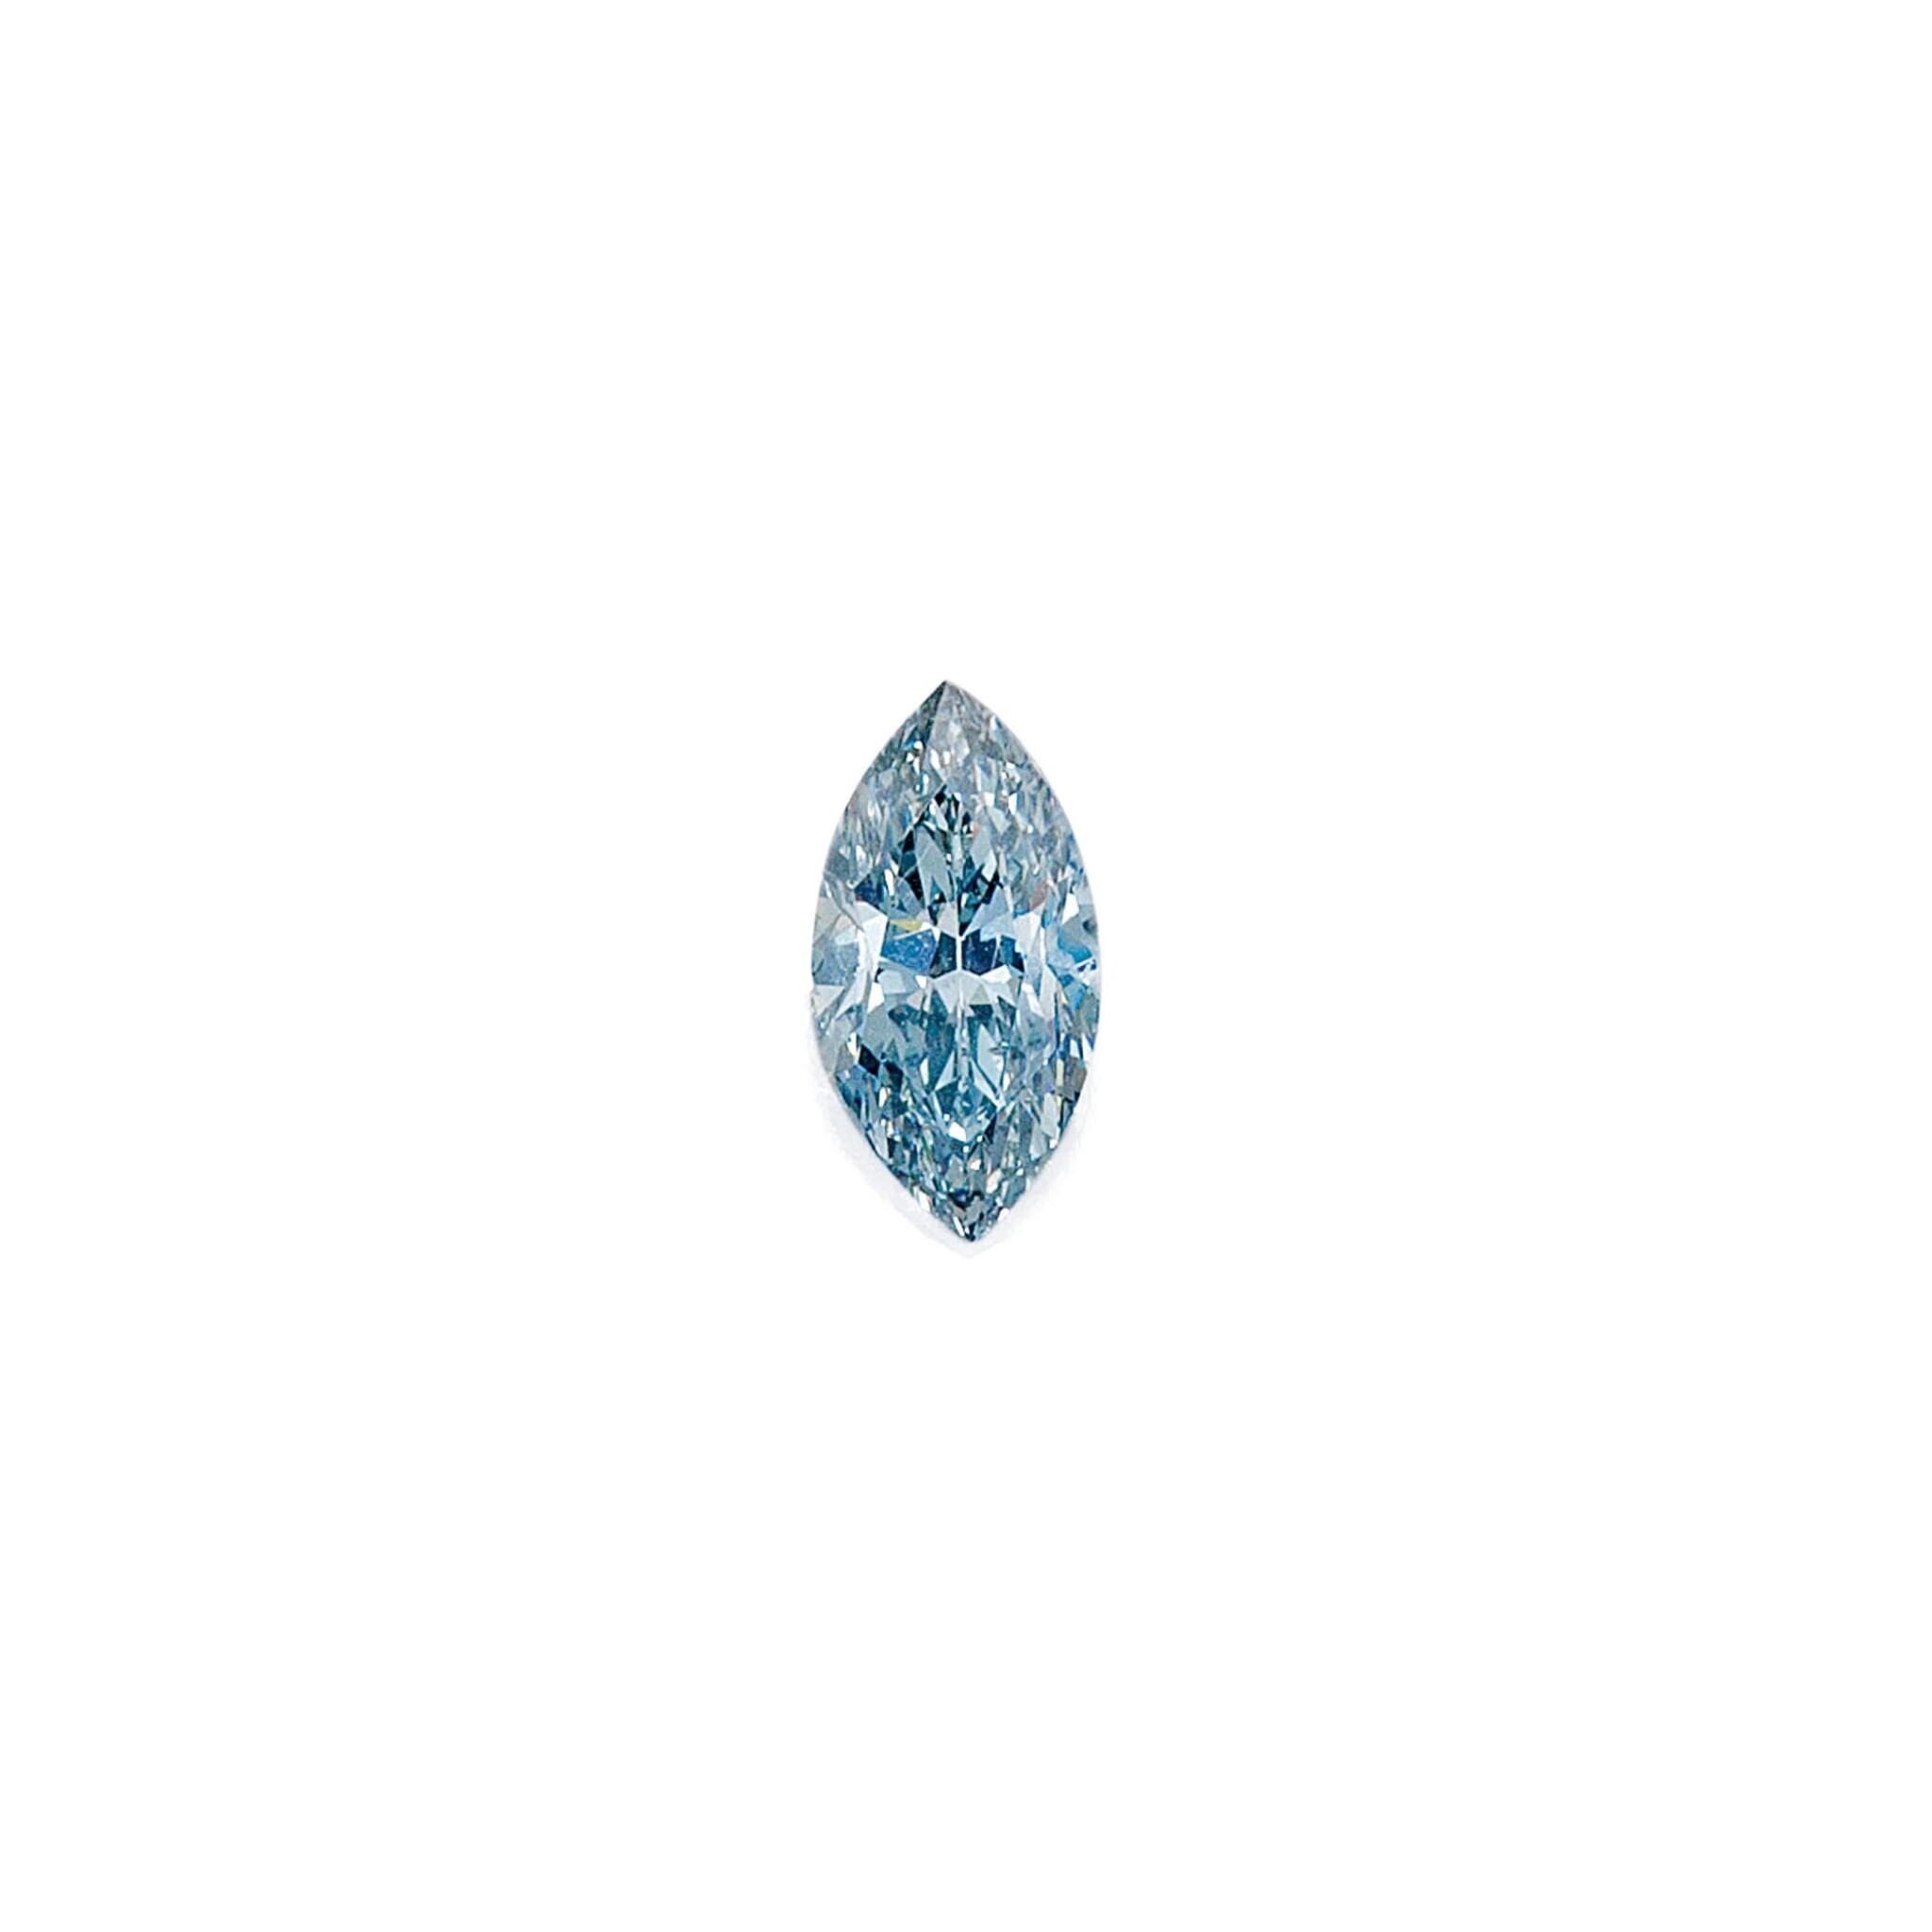 View full screen - View 1 of Lot 485. FANCY GRAYISH BLUE DIAMOND RING   彩灰藍色鑽石戒指.